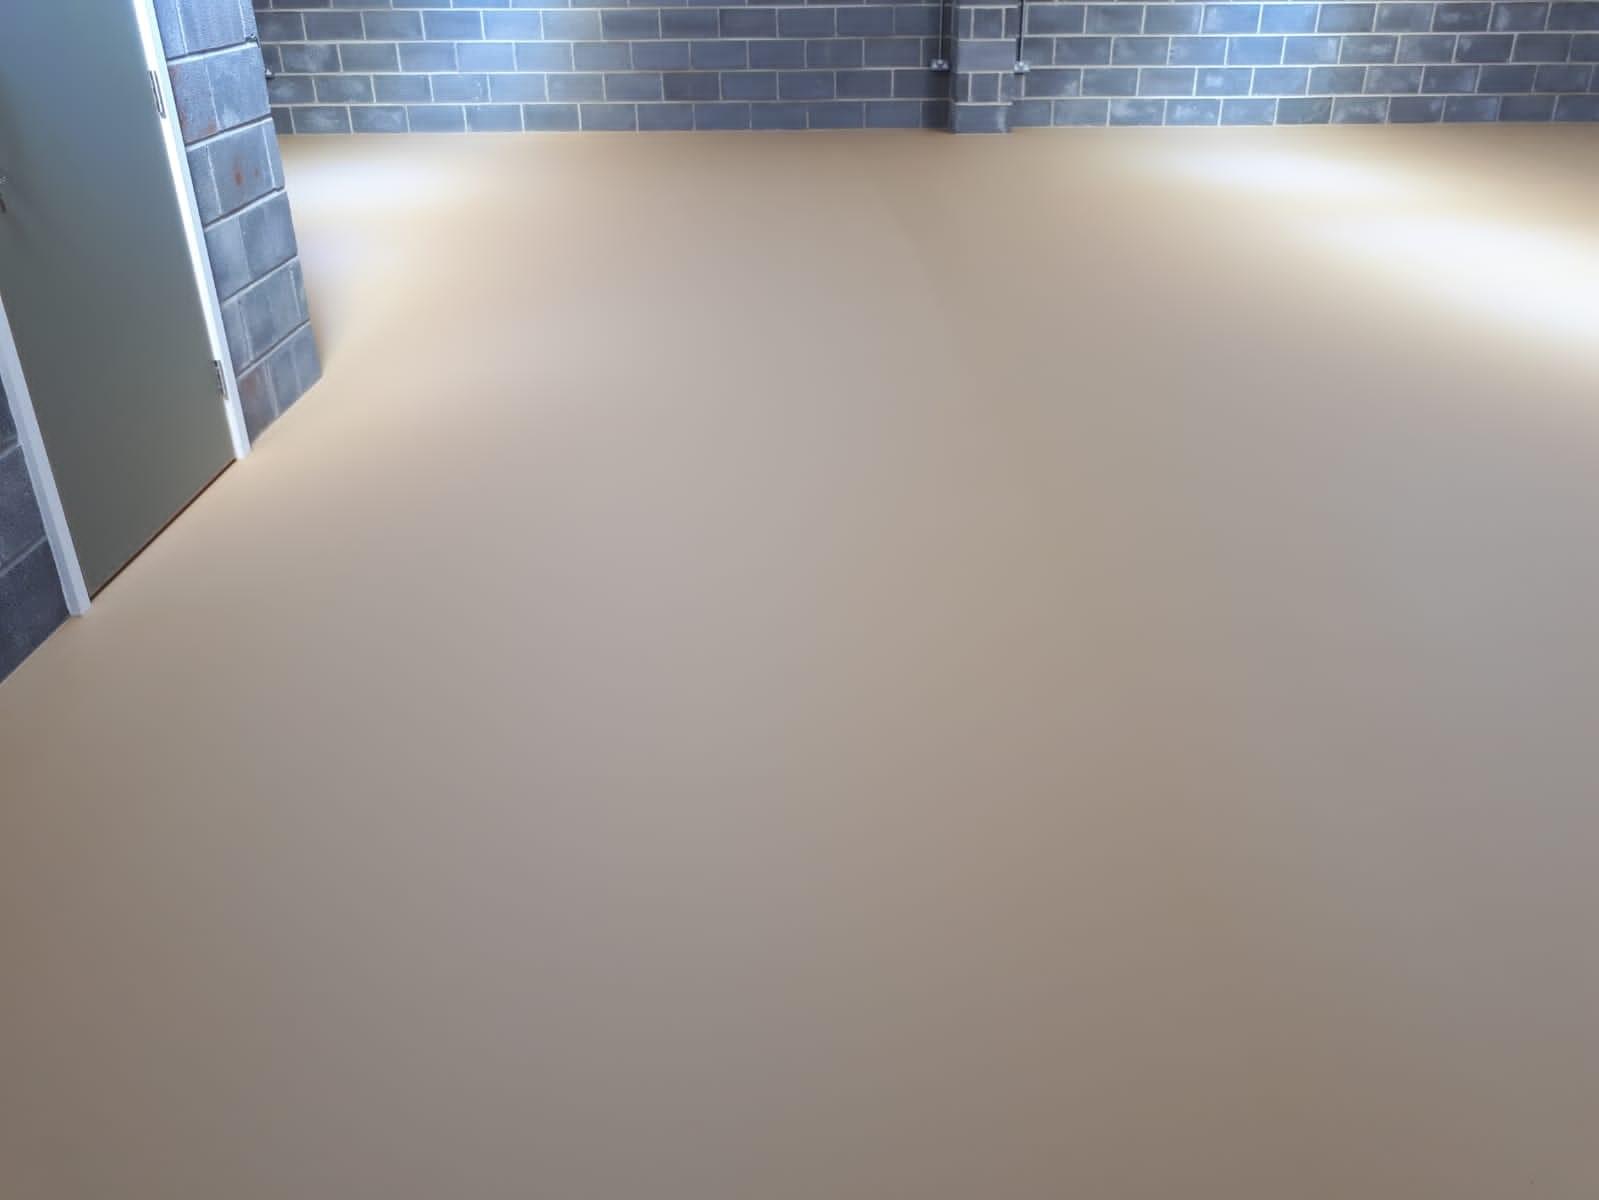 Yate Boxing Club Pulastic Classic 110 multiuse boxing indoor sports floor